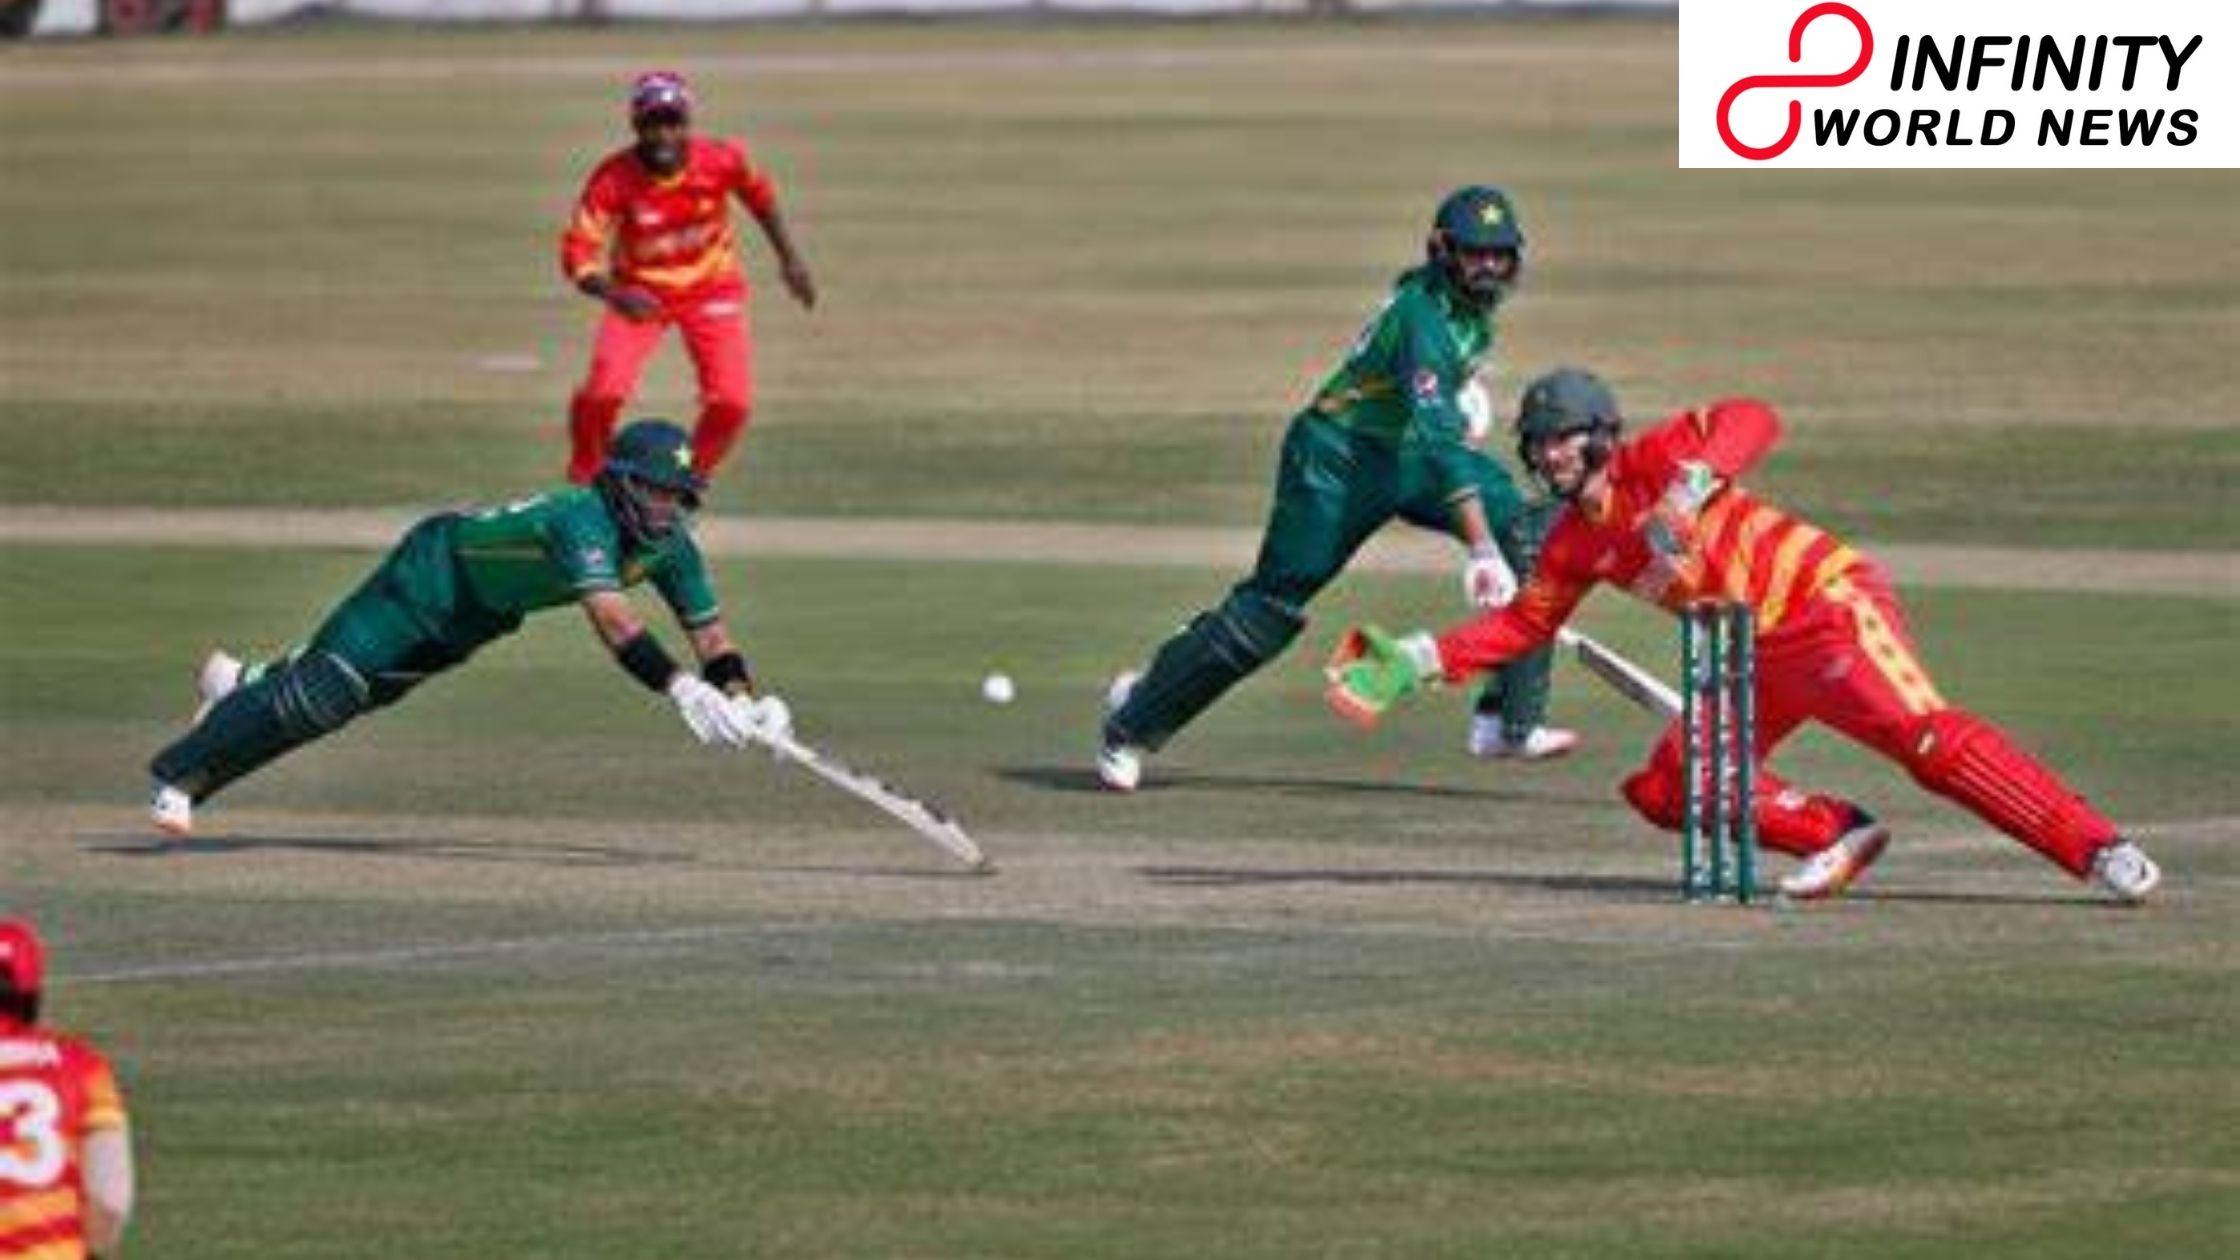 Pakistan batsmen Harris Sohail, Imam Ul Haq, finish up on striker's end